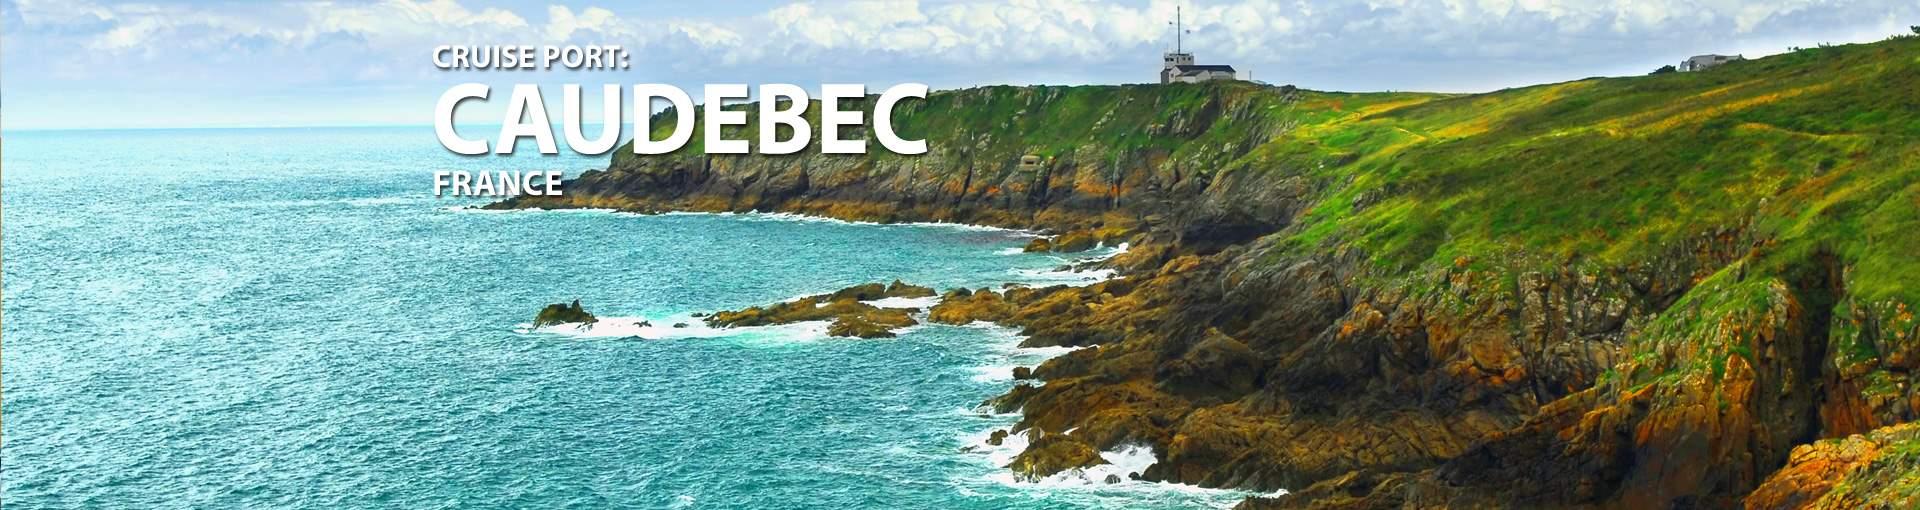 Cruises to Caudebec, France